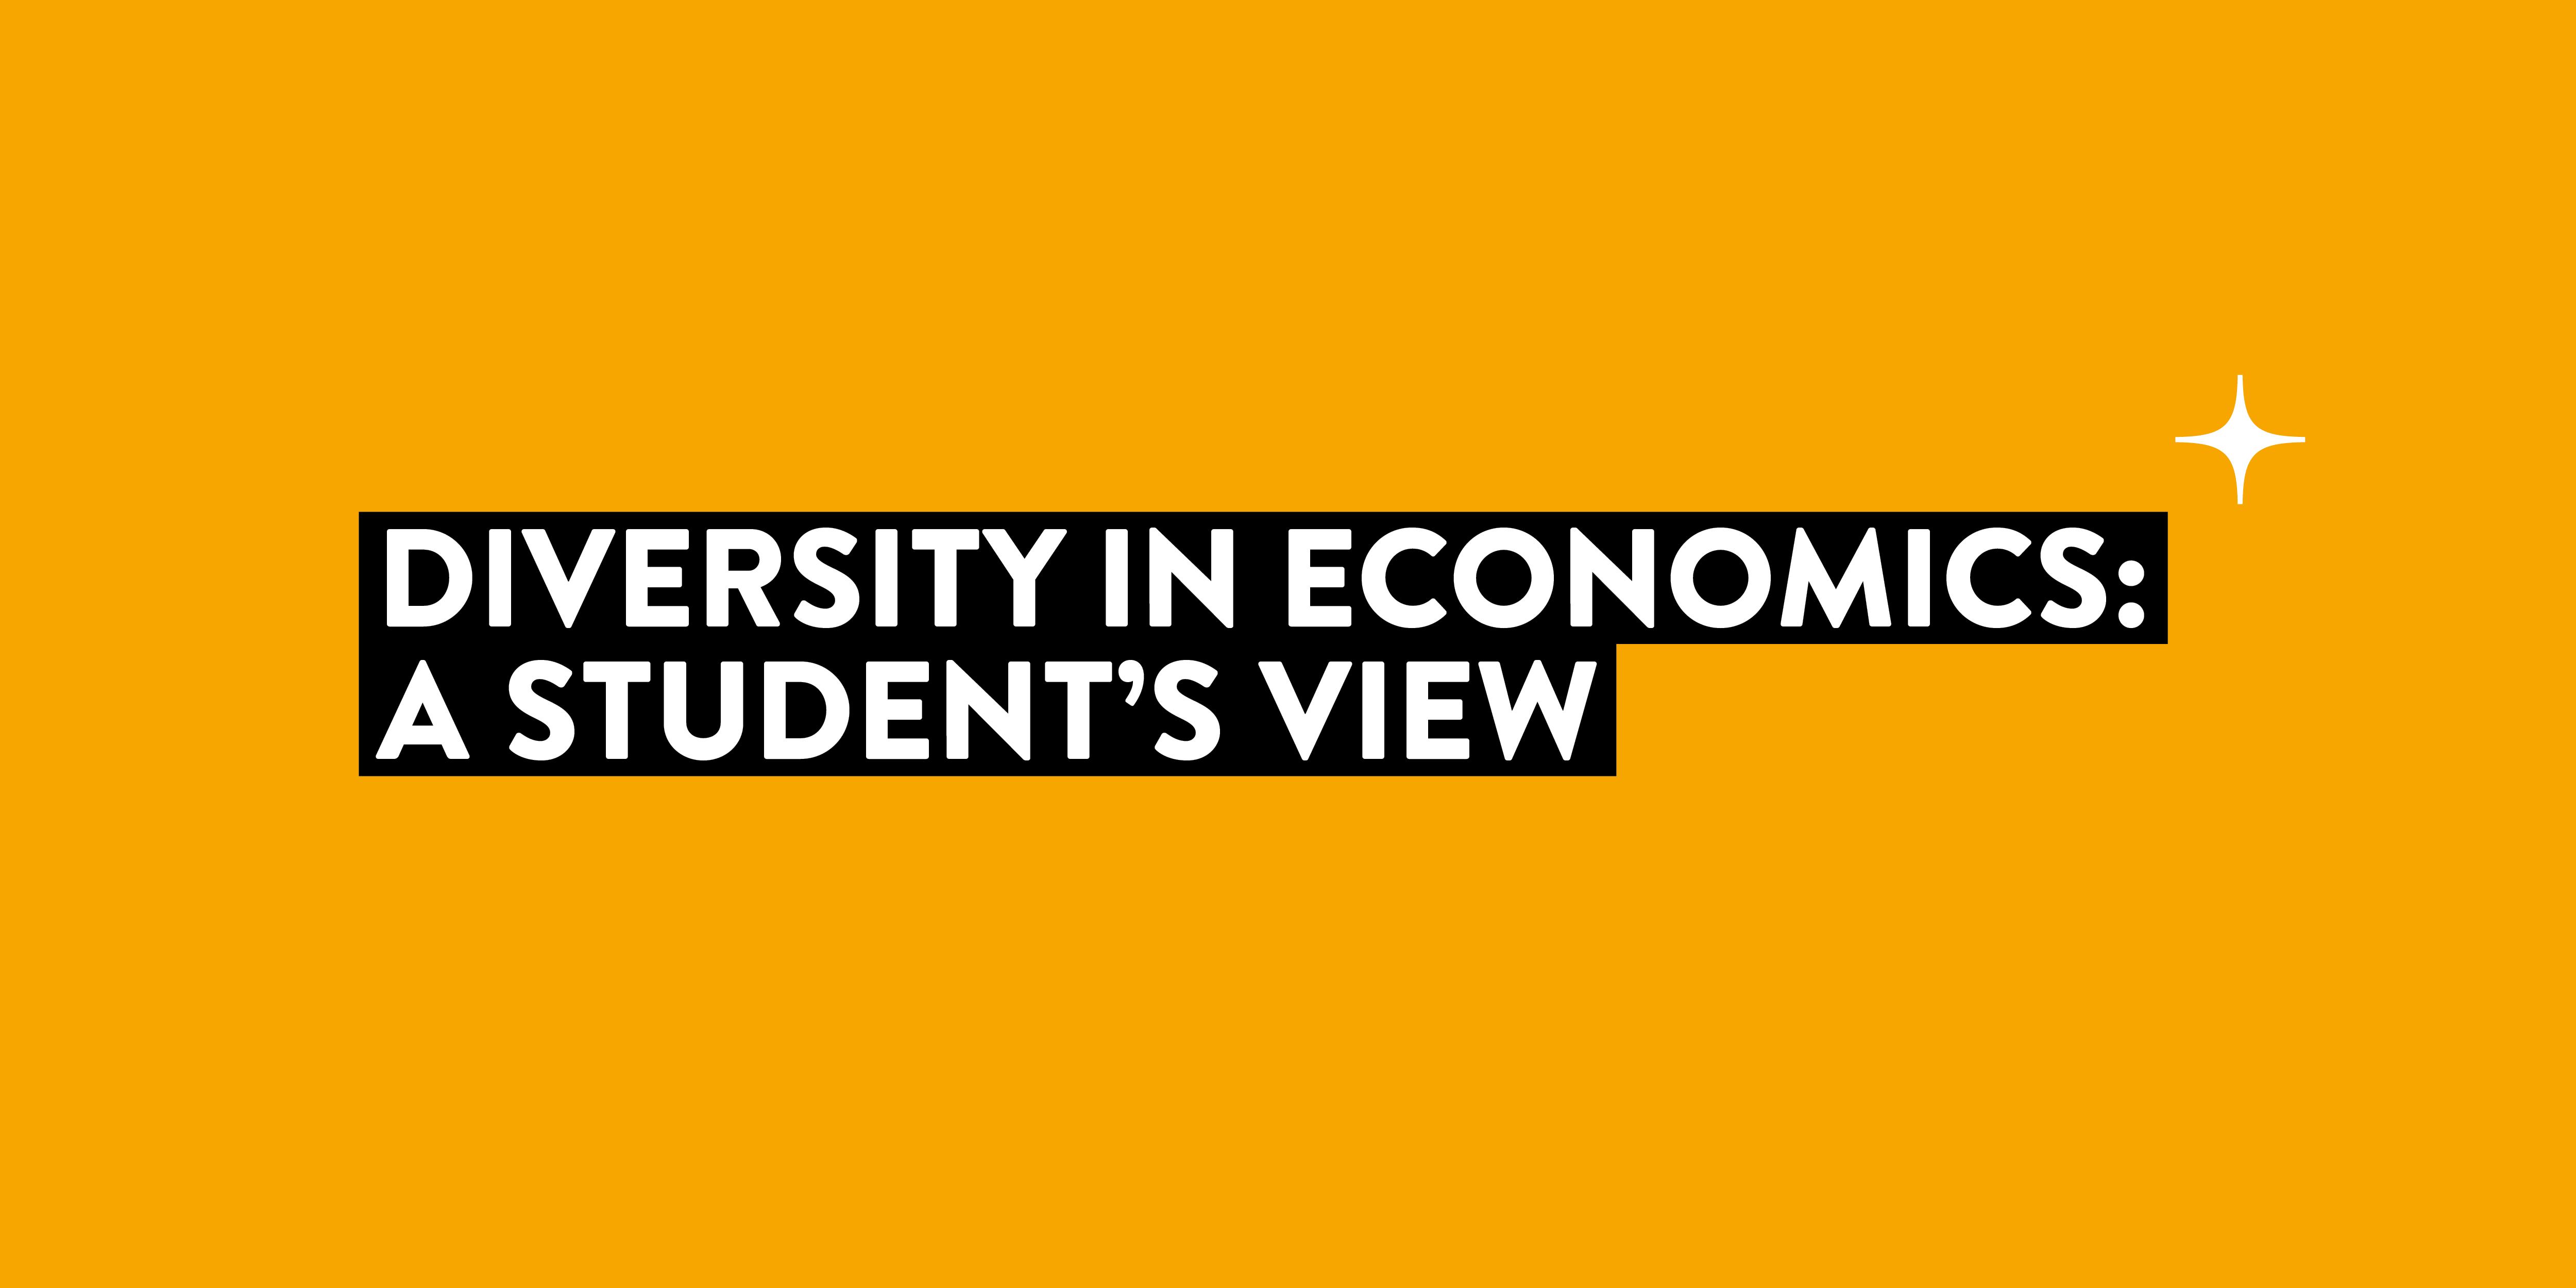 Diversity in Economics: A Student's View